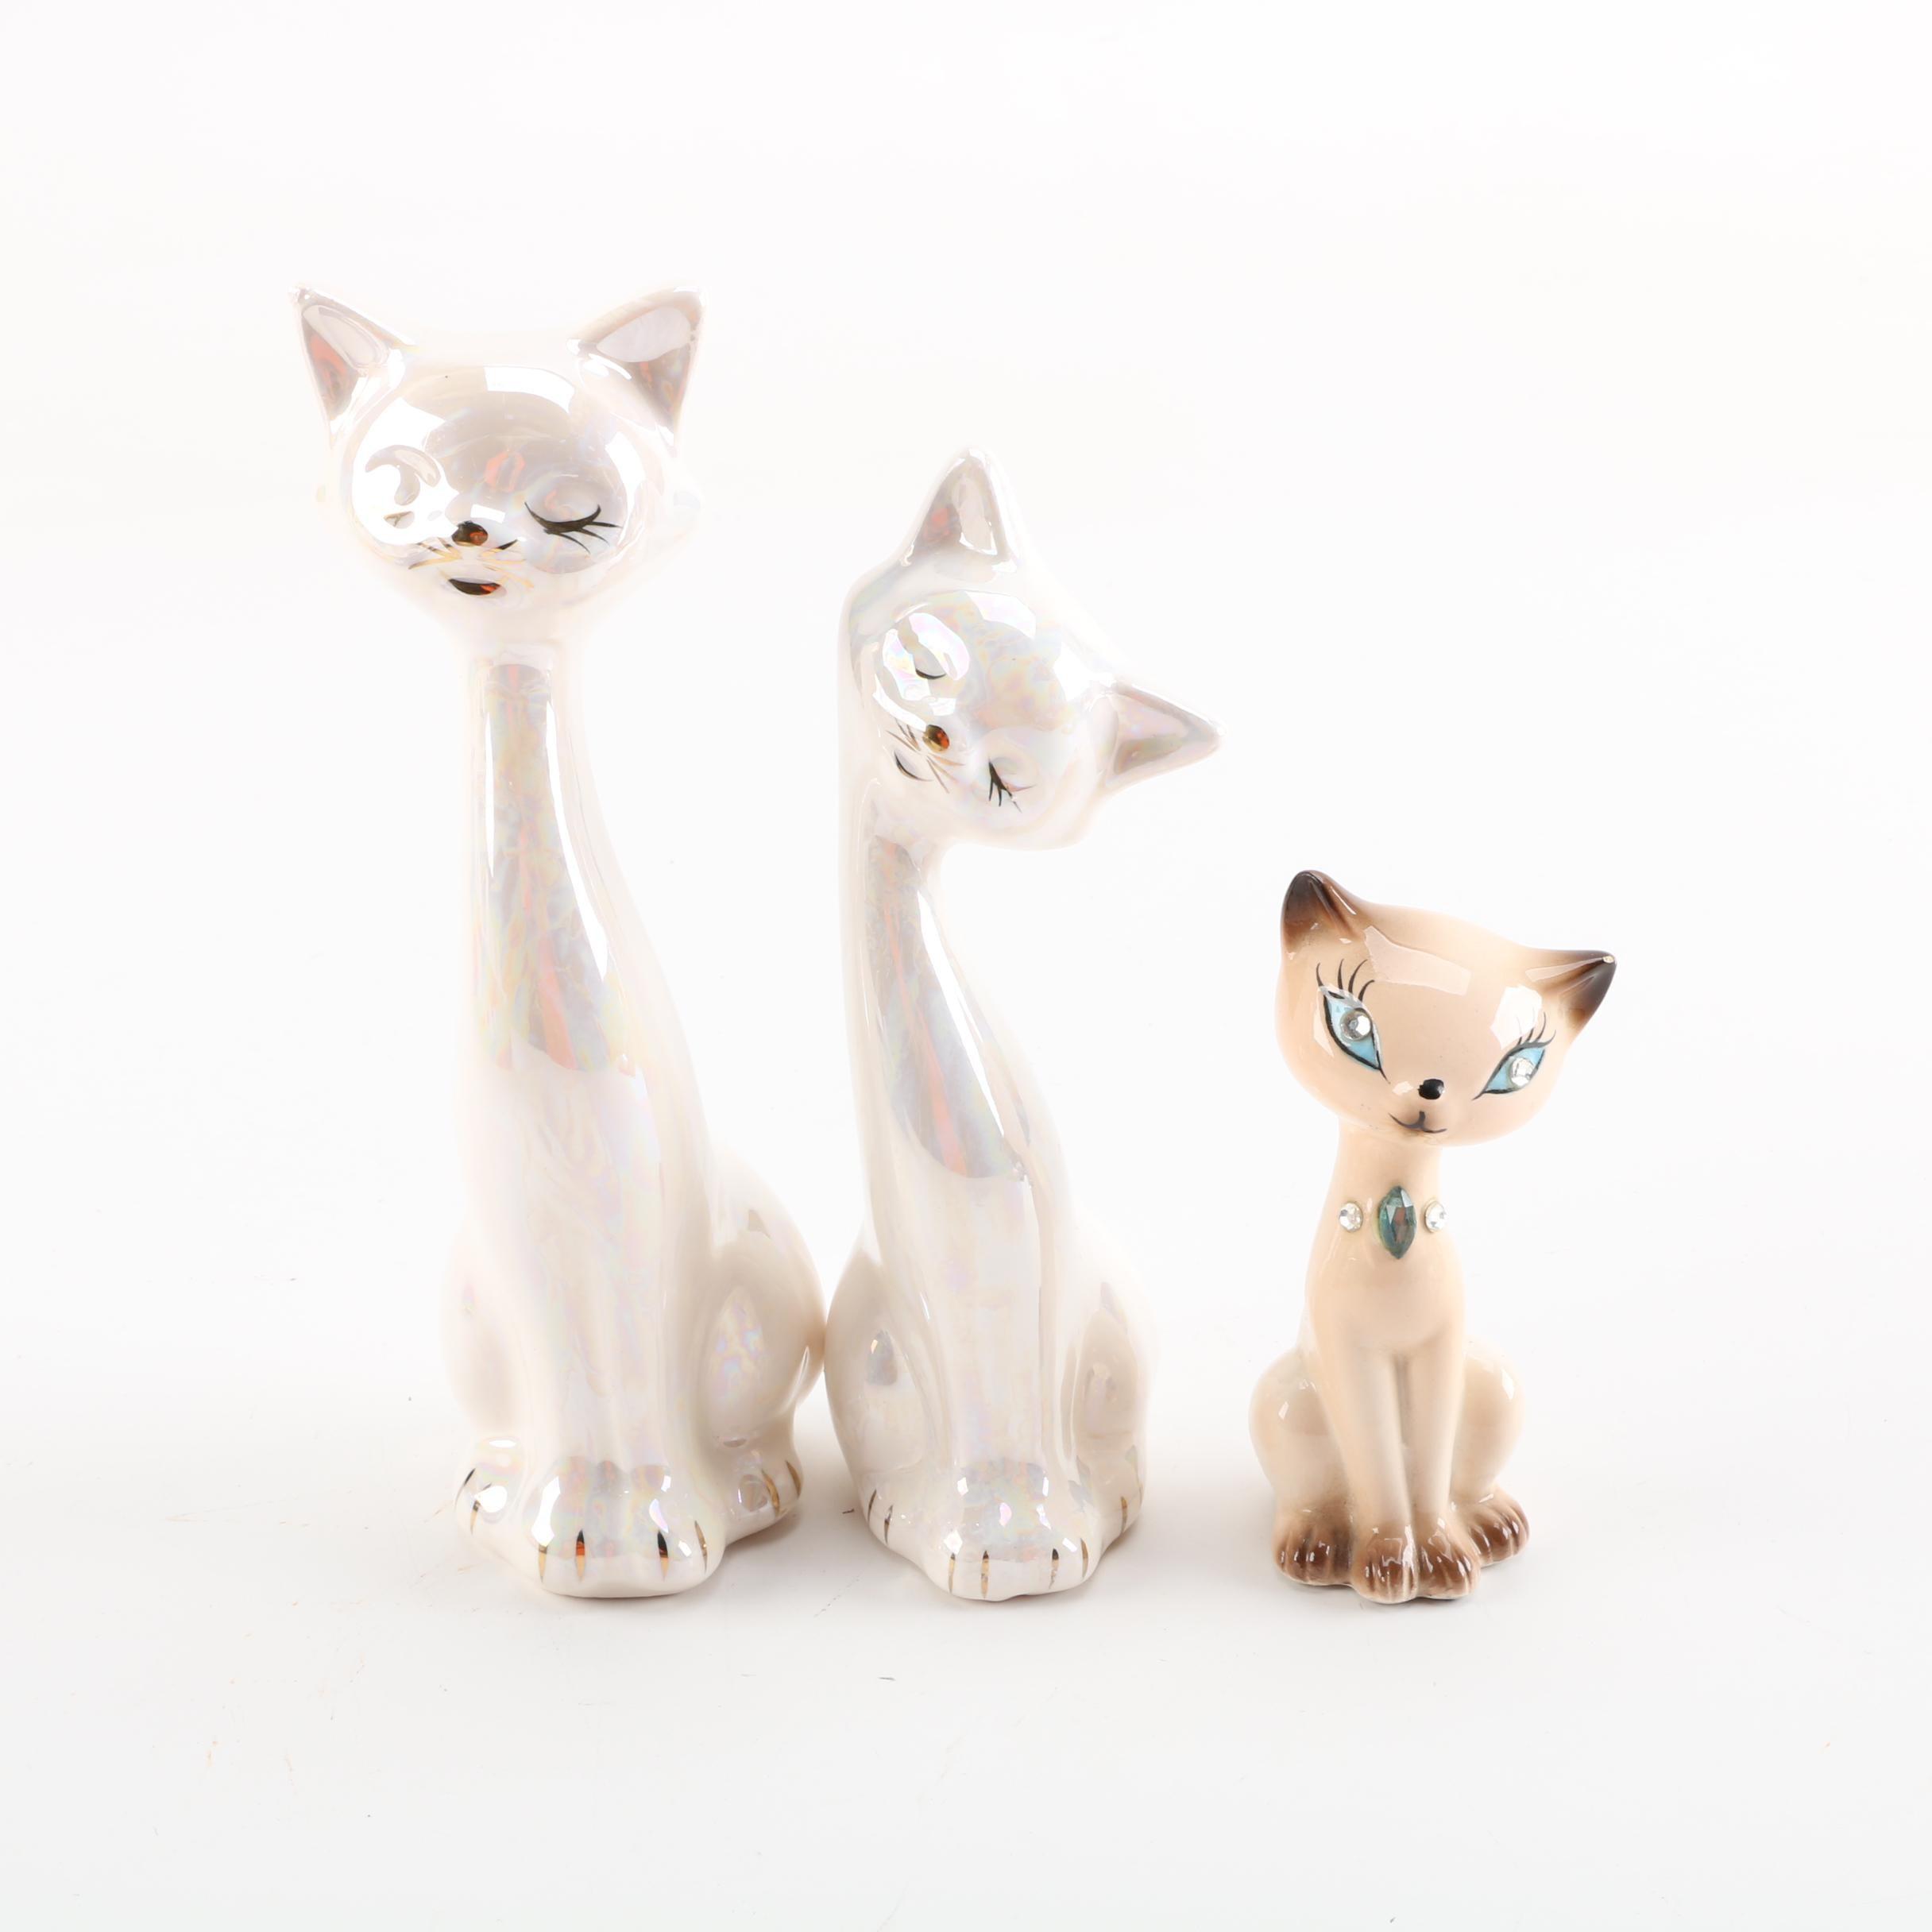 Vintage Ceramic Seated Cat Figurines